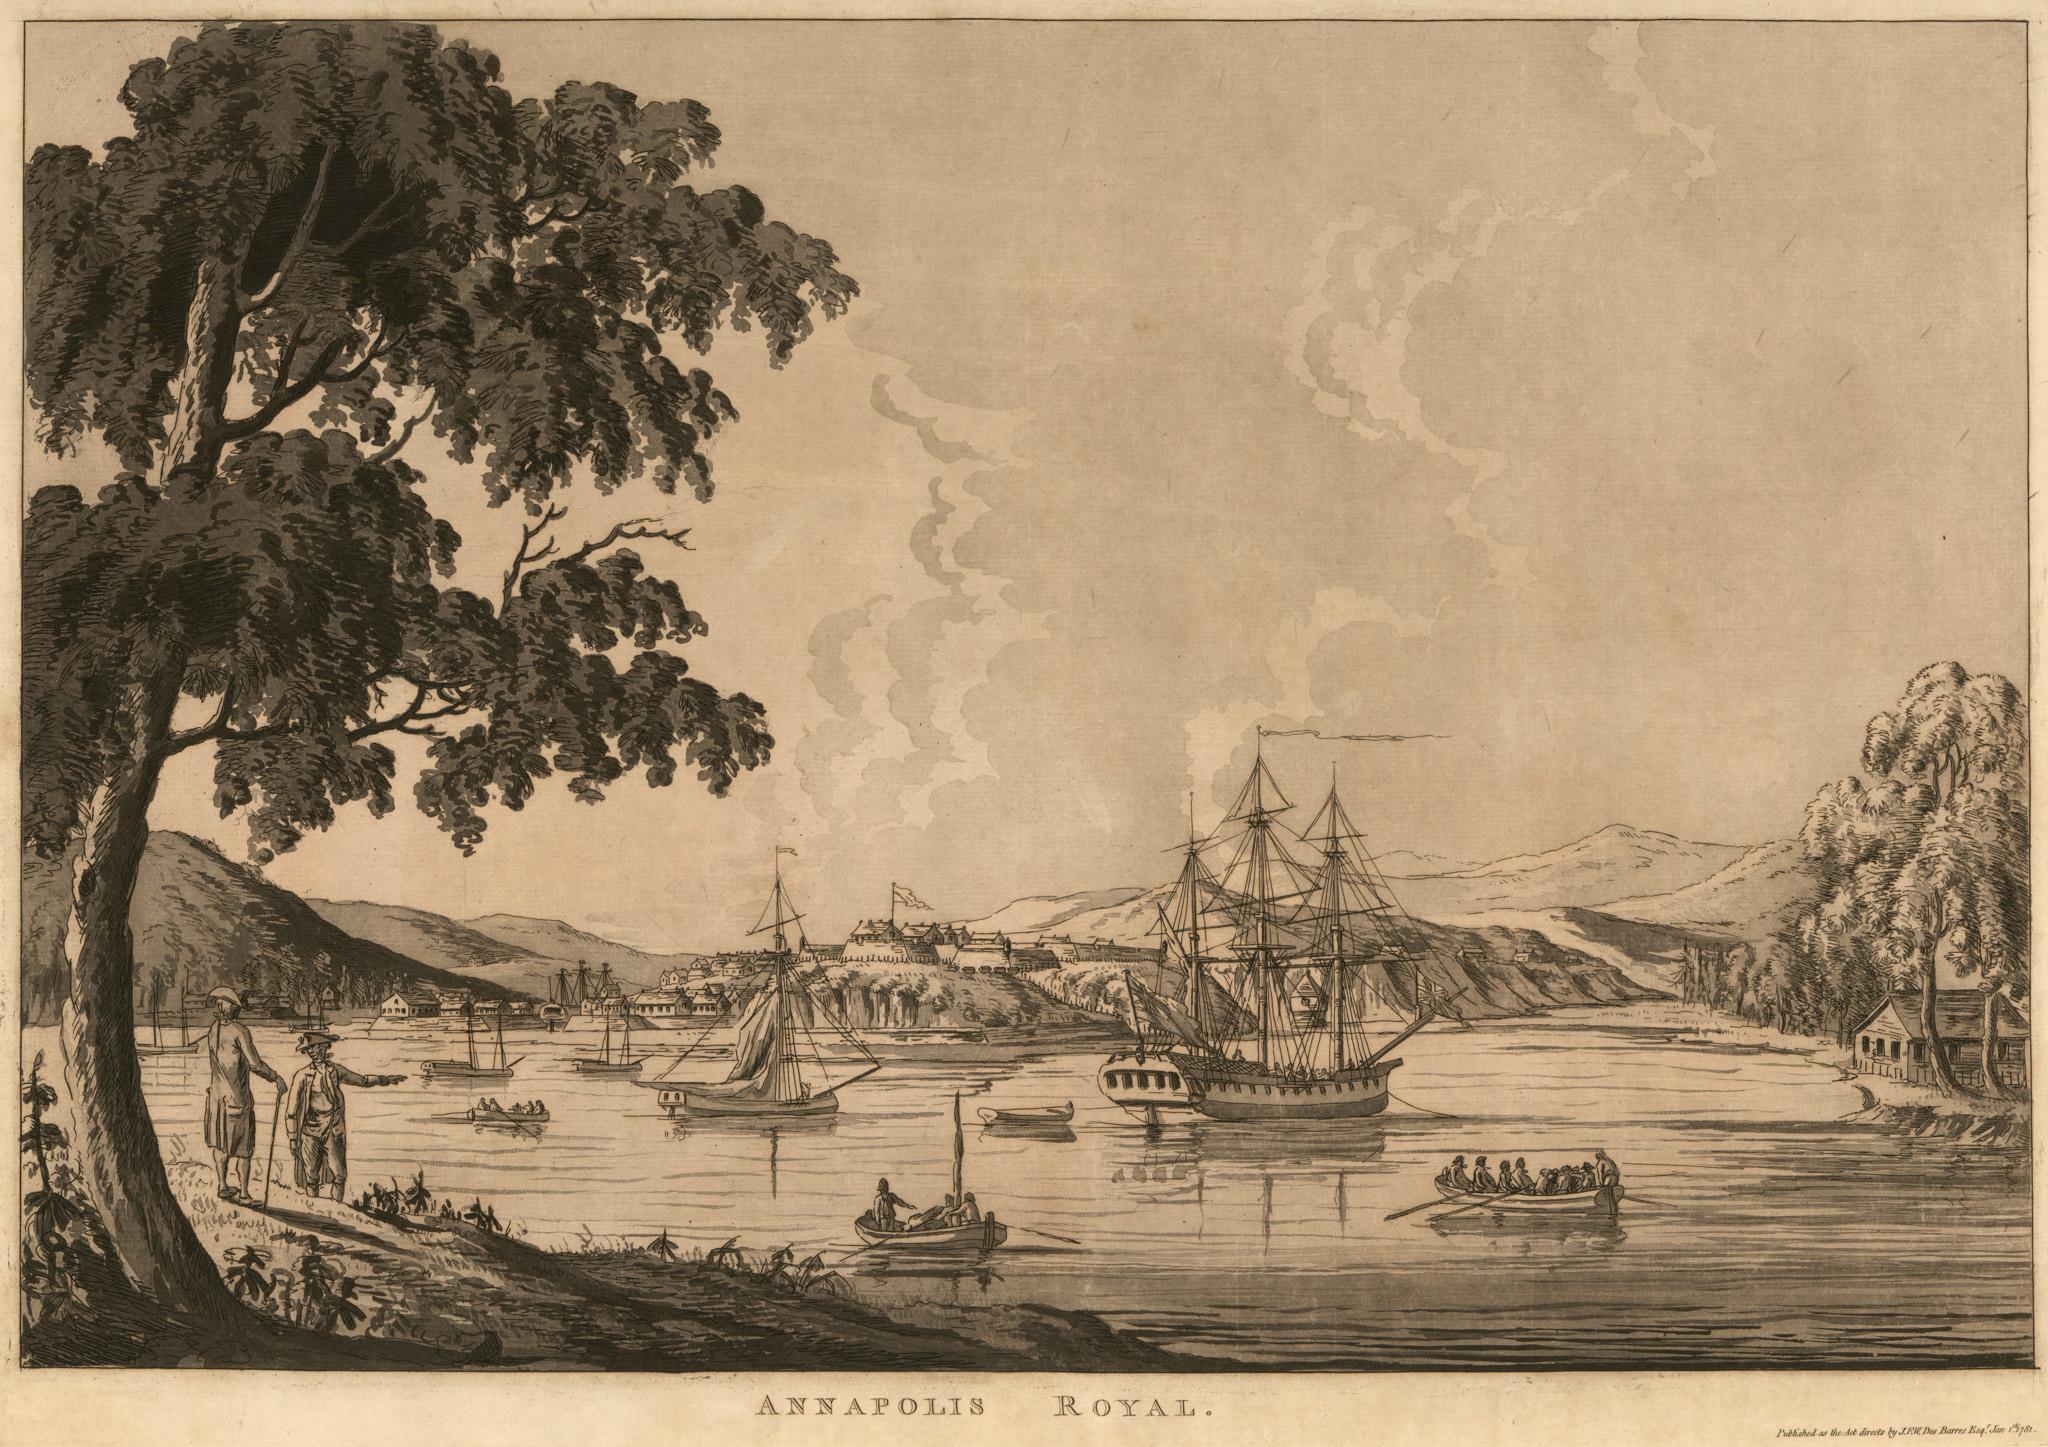 1779 Annapolis Royal by JFW DesBarress